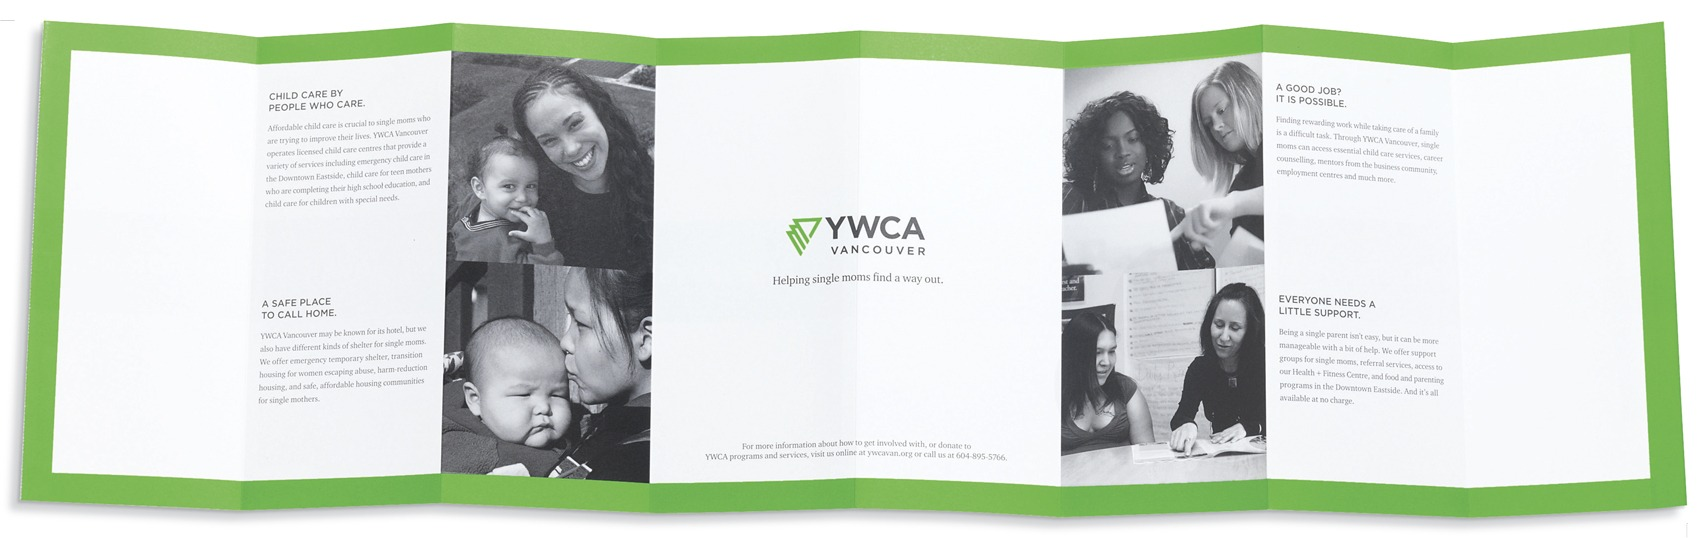 YWCA brochure